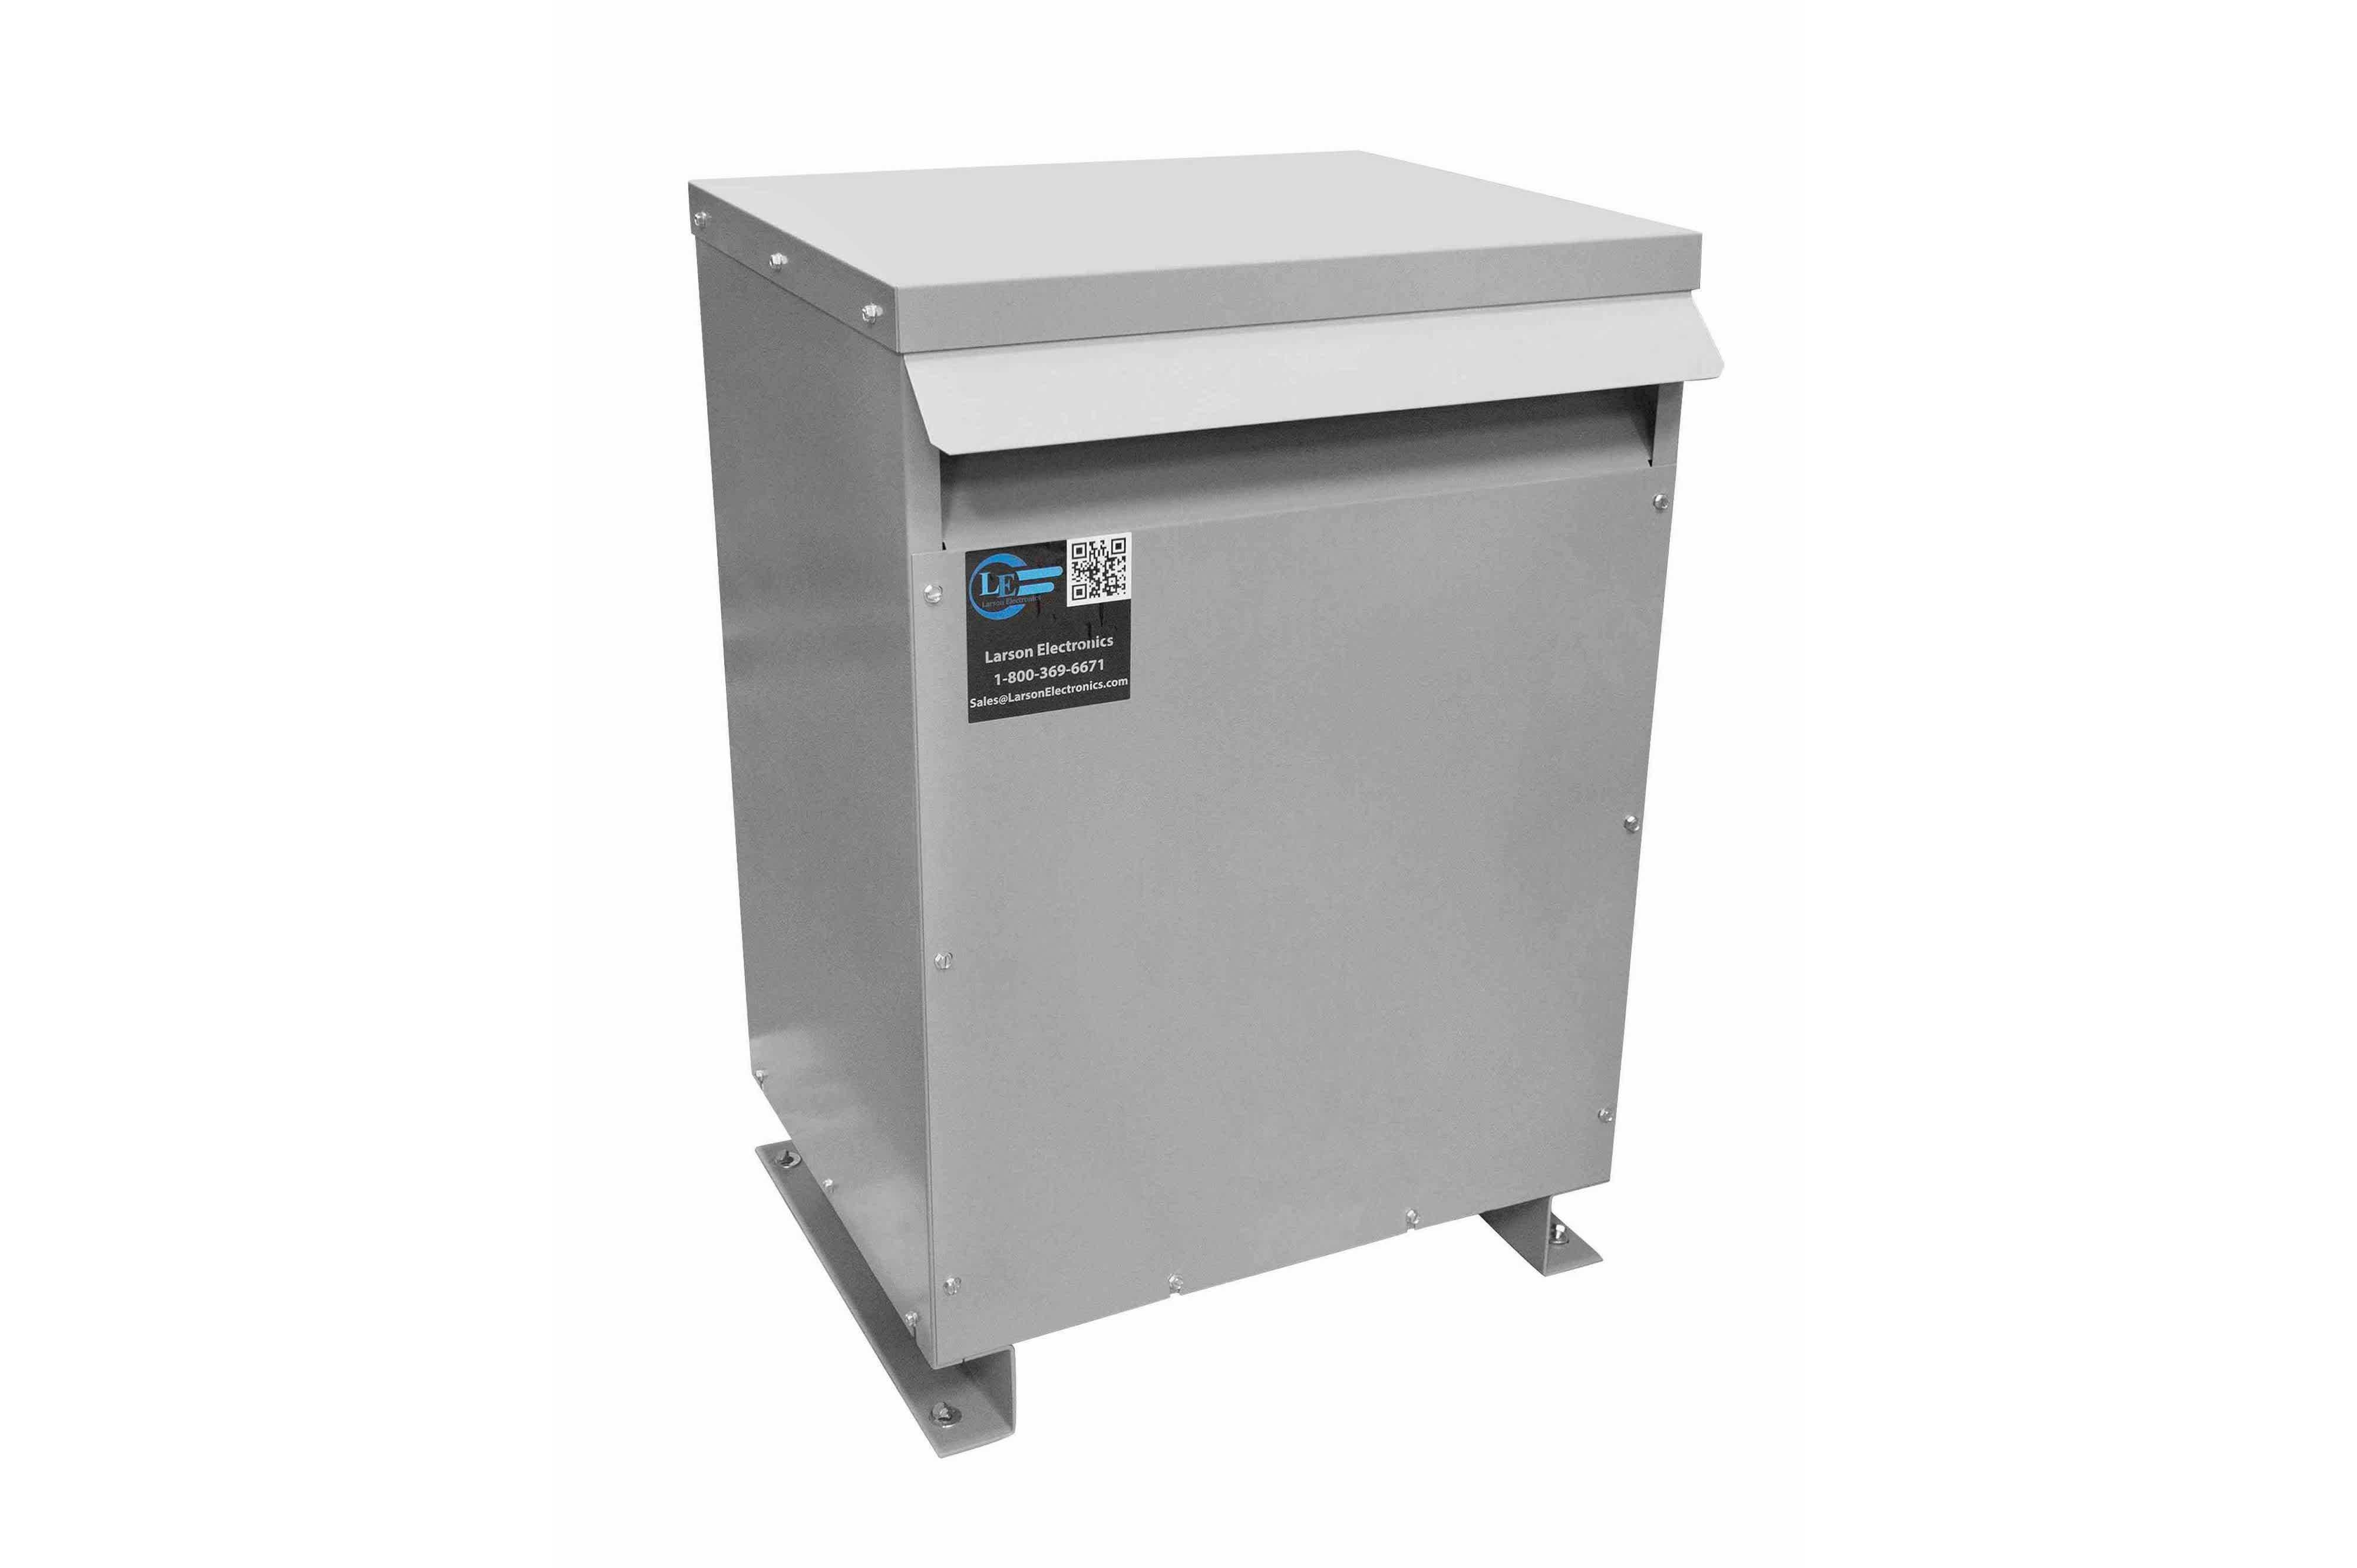 20 kVA 3PH Isolation Transformer, 400V Wye Primary, 600Y/347 Wye-N Secondary, N3R, Ventilated, 60 Hz